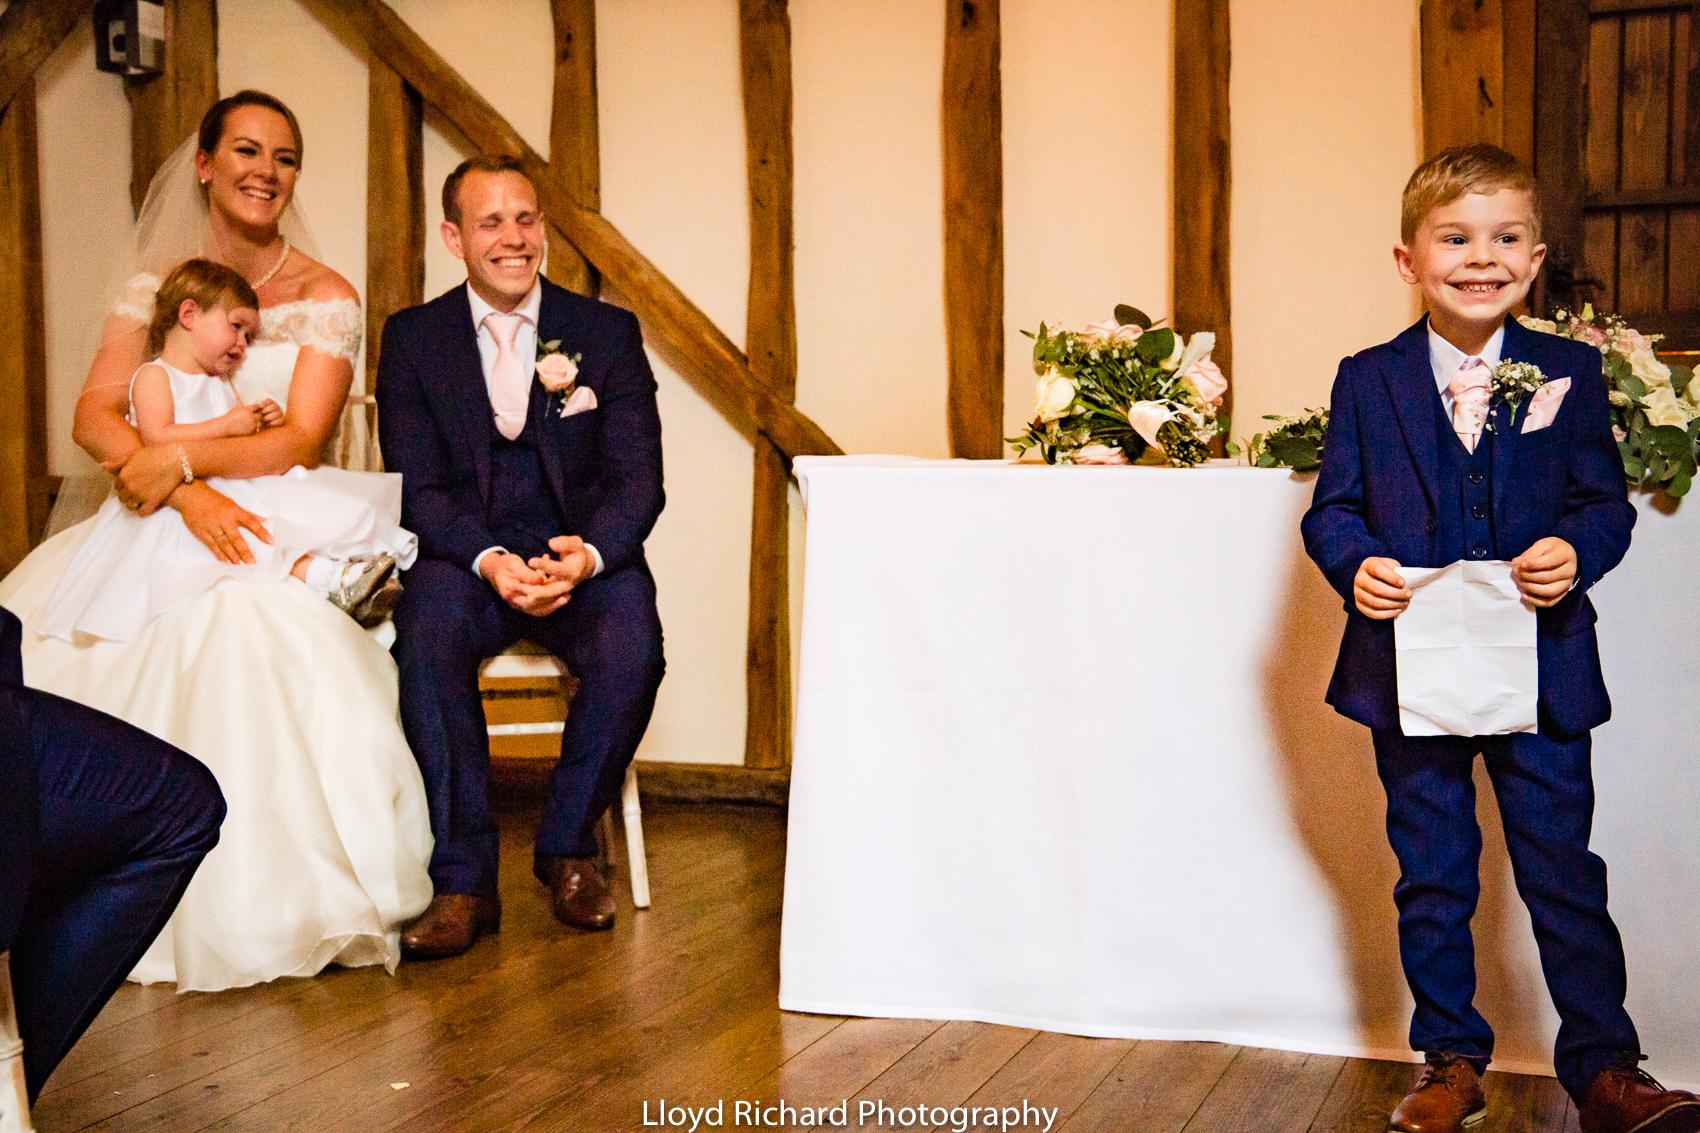 wedding reading at at Pitt Hall Barn